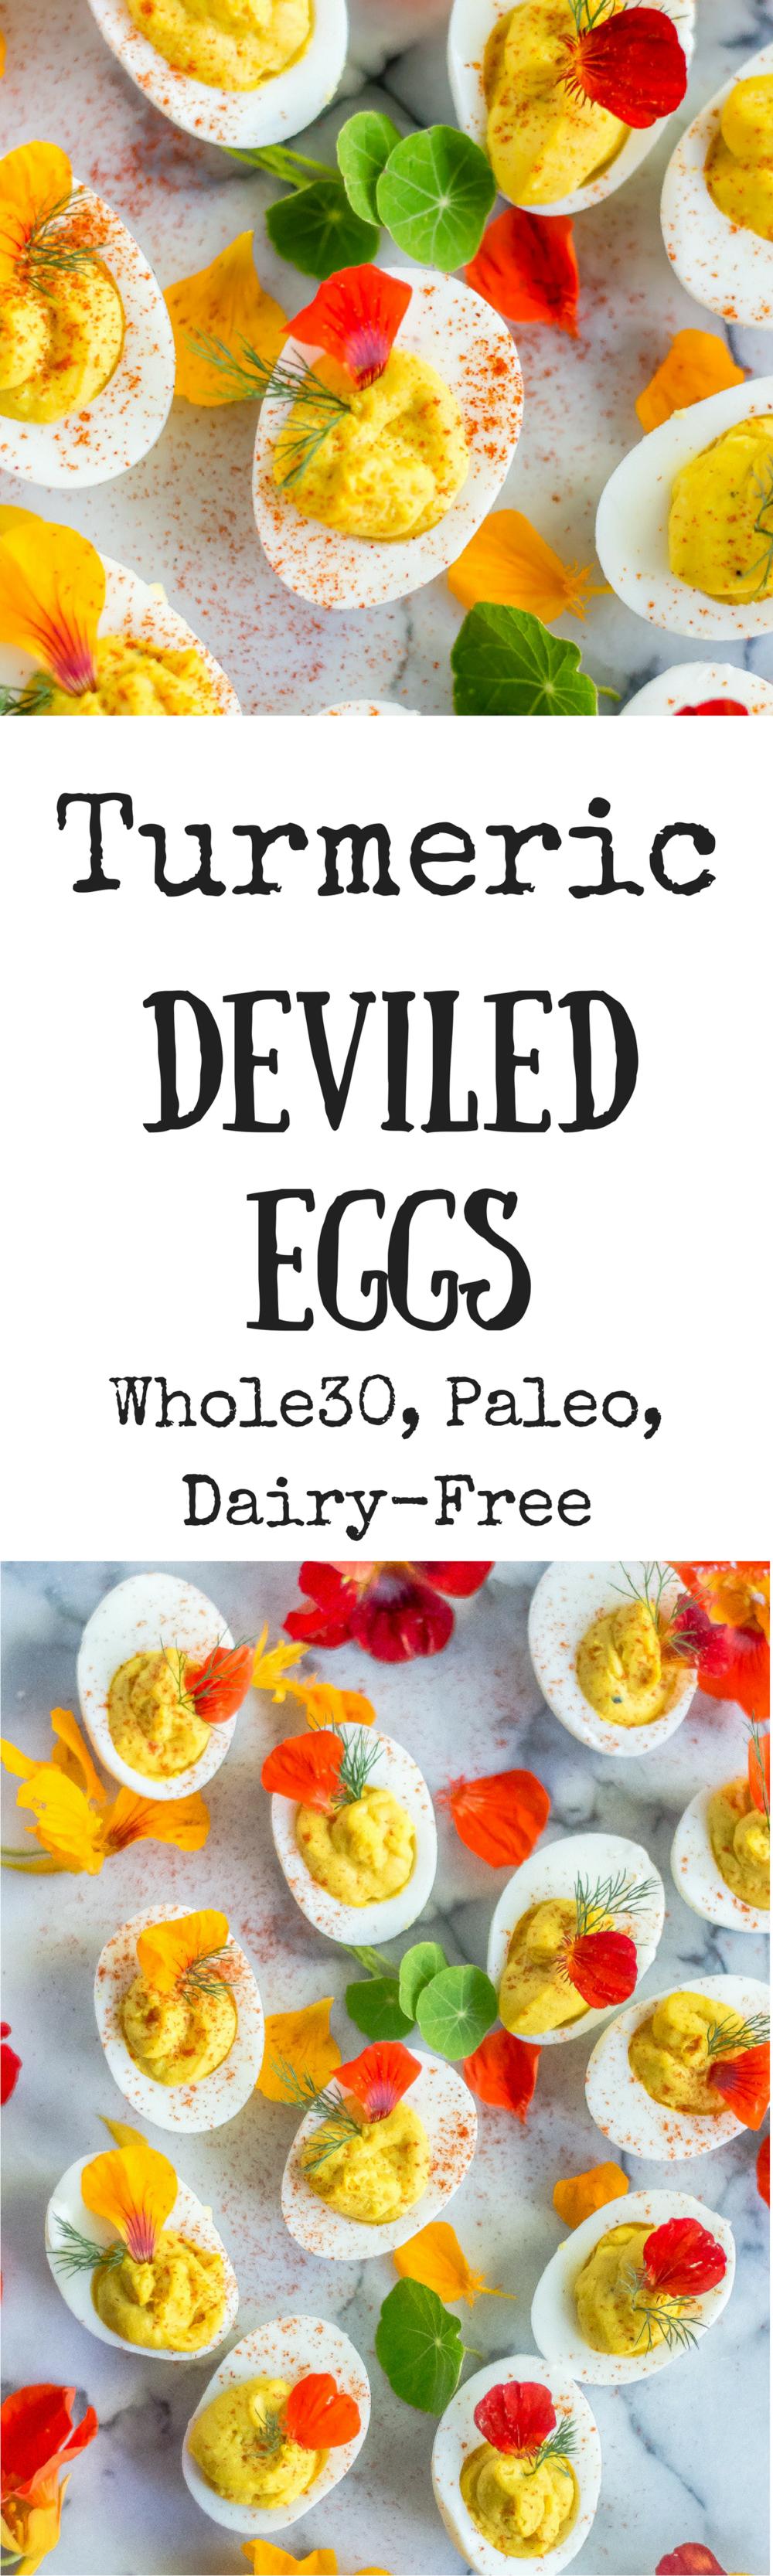 Turmeric Deviled Eggs